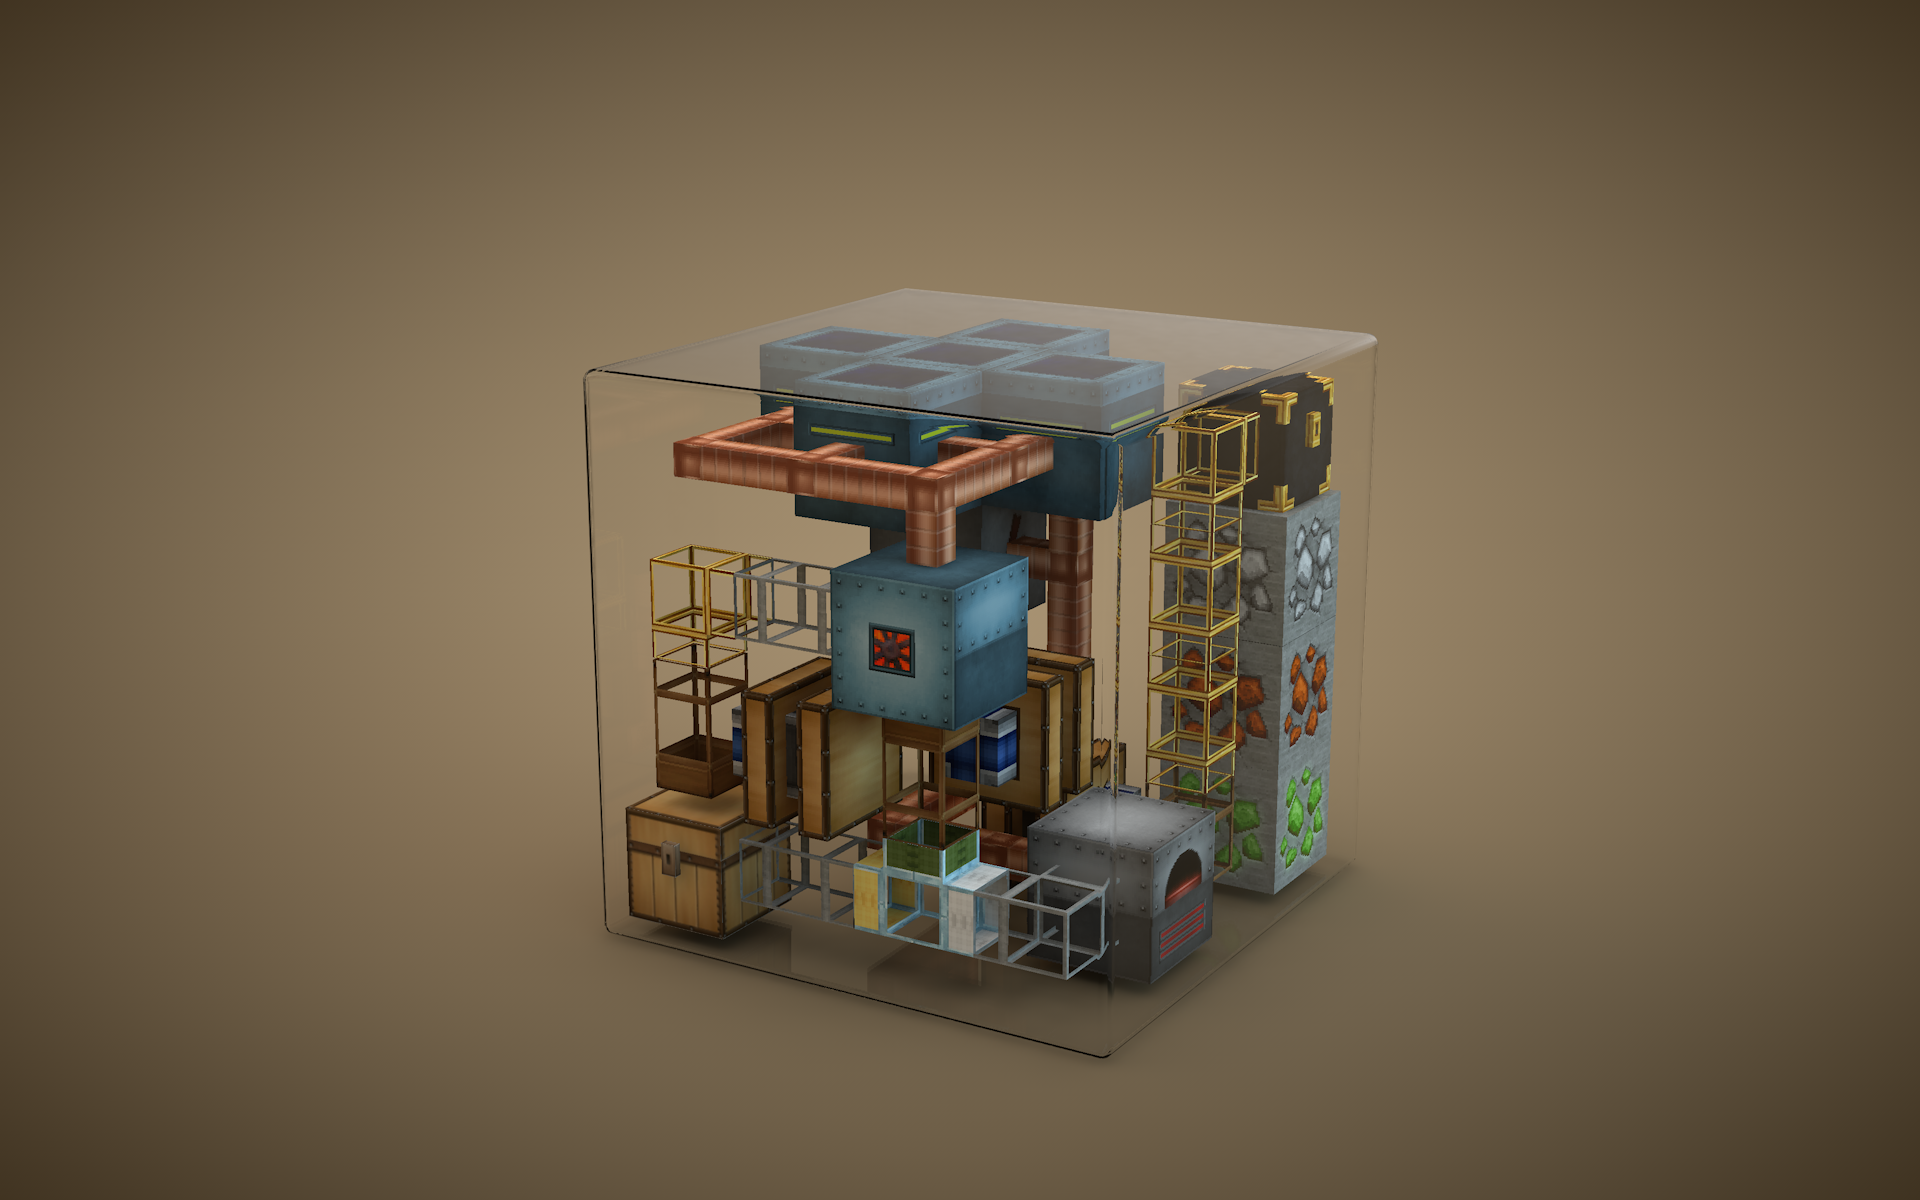 Minecraft 3d minimal wallpaper 1920x1200 42406 WallpaperUP 1920x1200